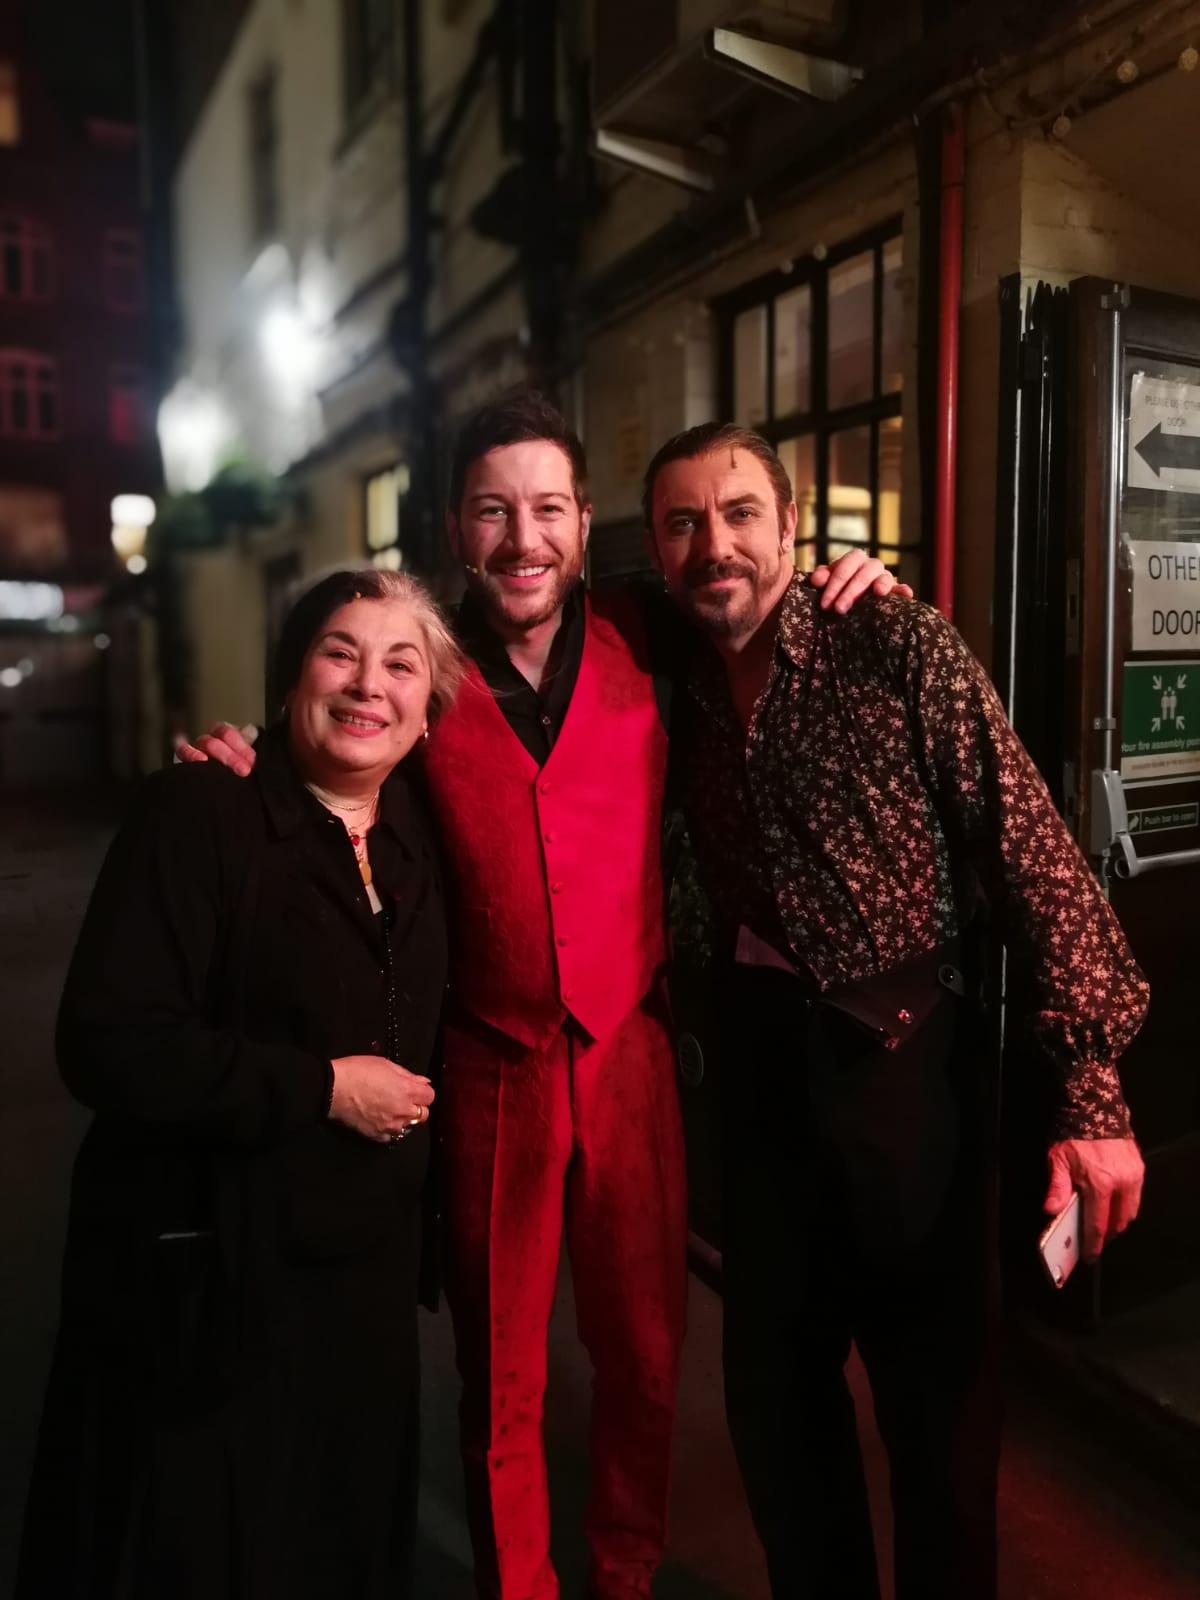 Piccadilly intermission with Eve Polycarpou and Matt Carle